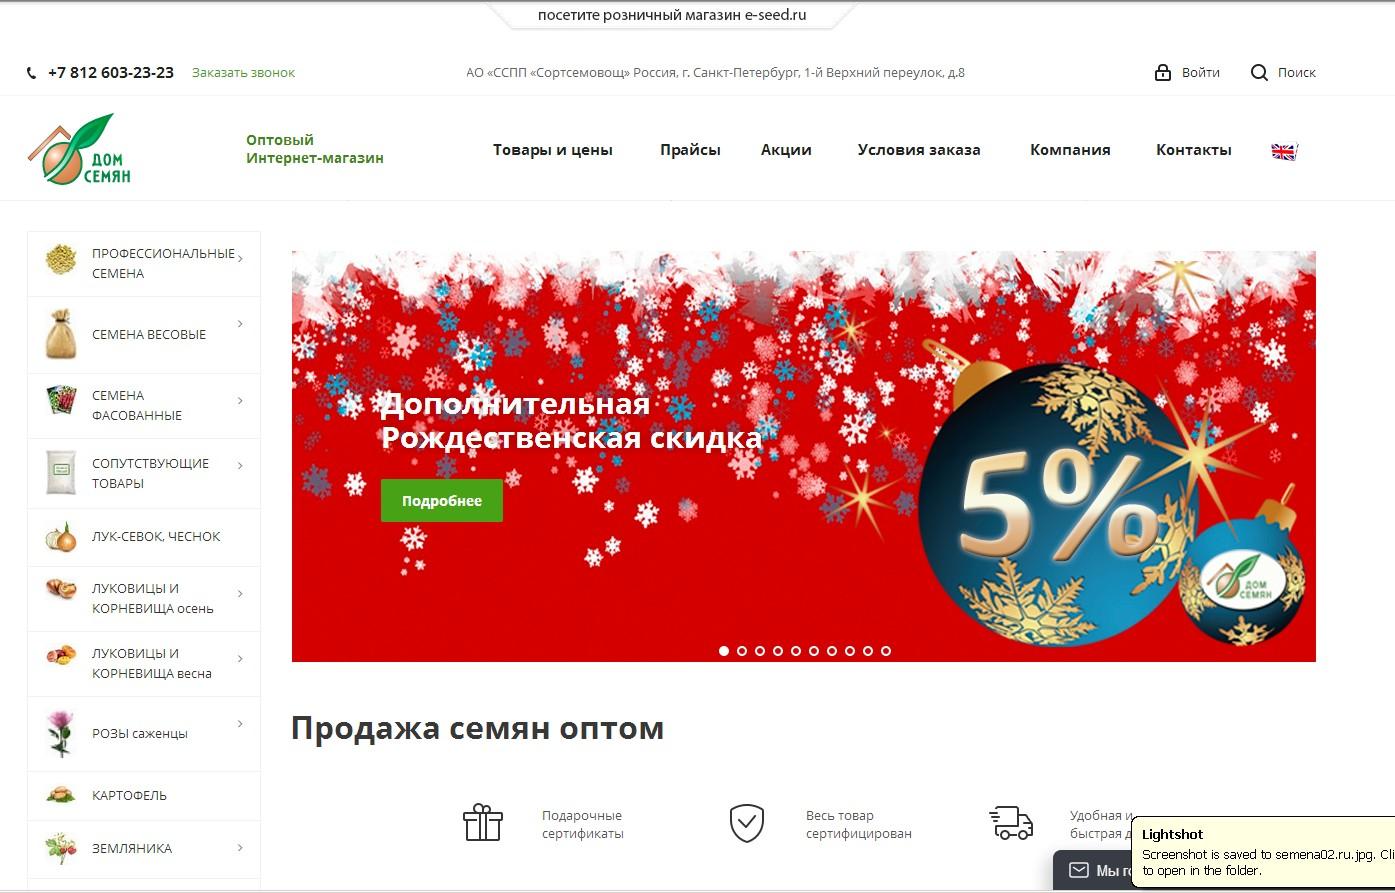 логотип сортсемовощ.рф